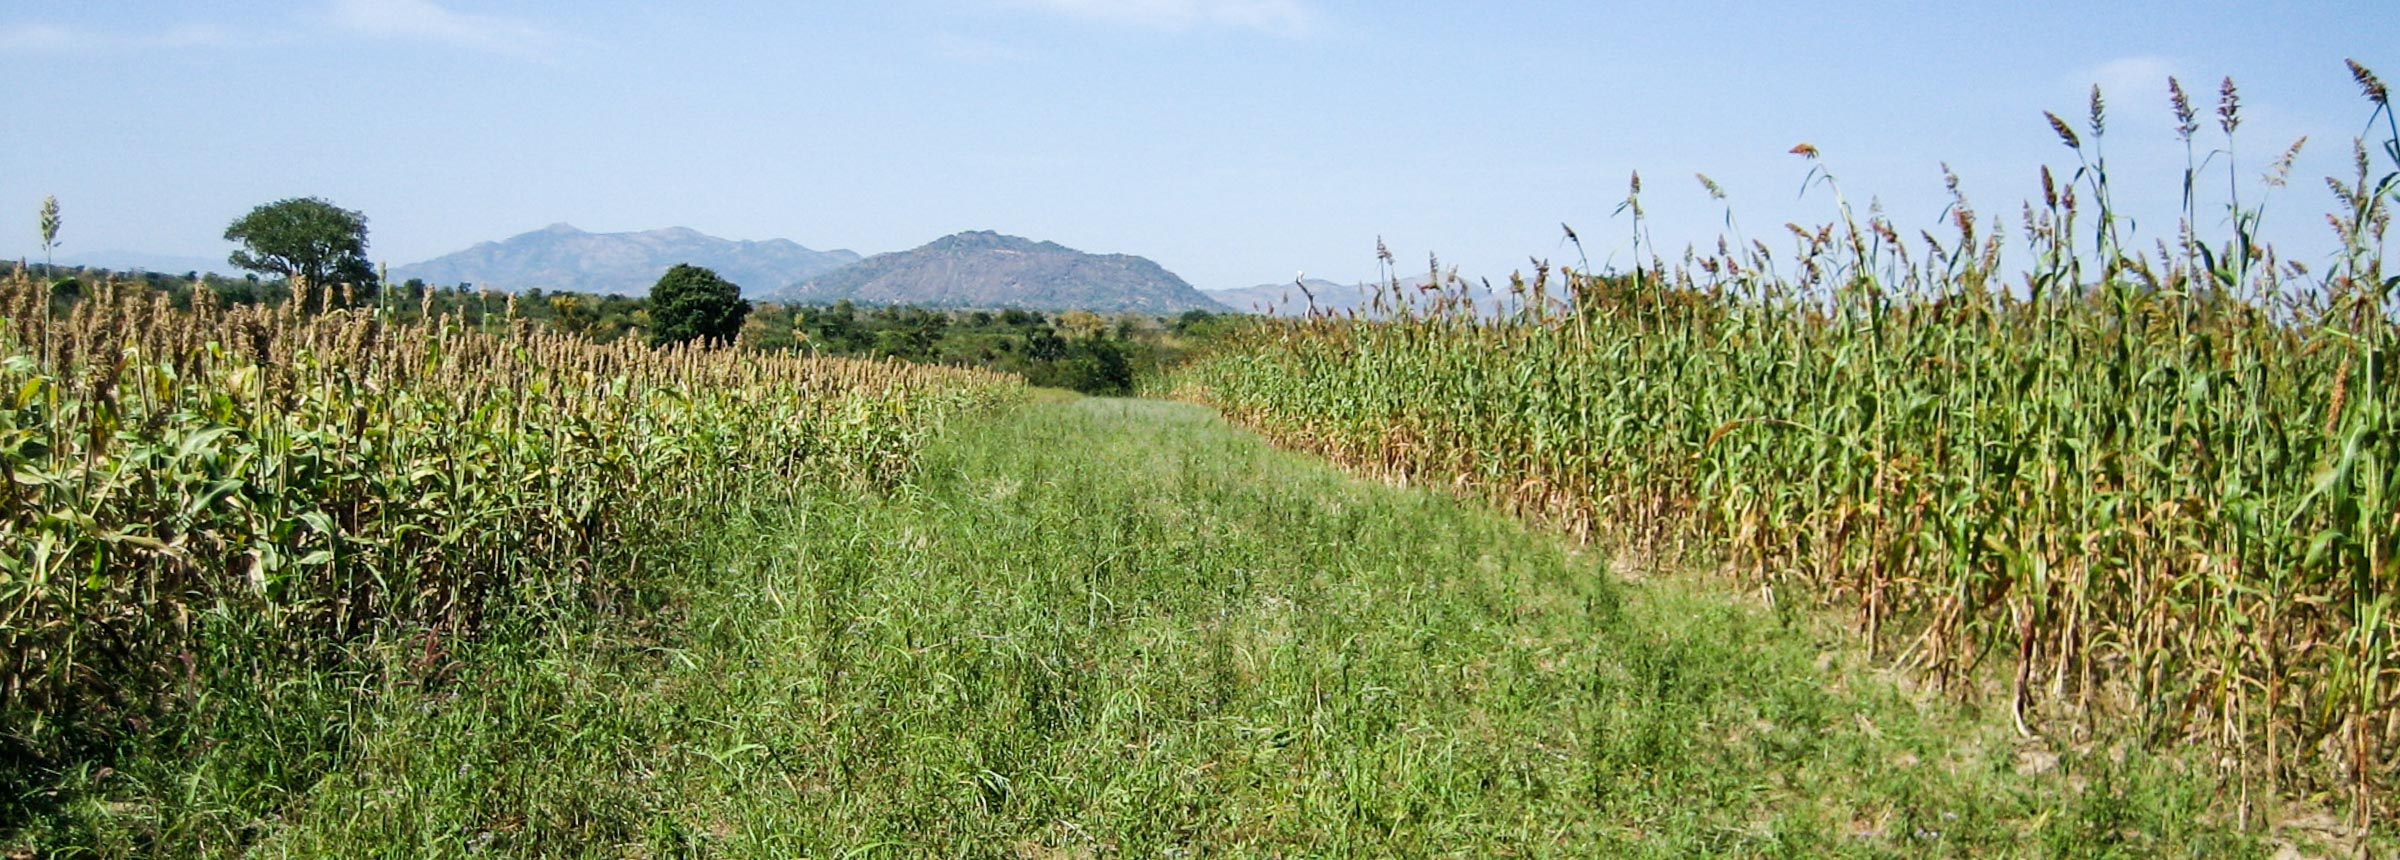 Nigeria landscape